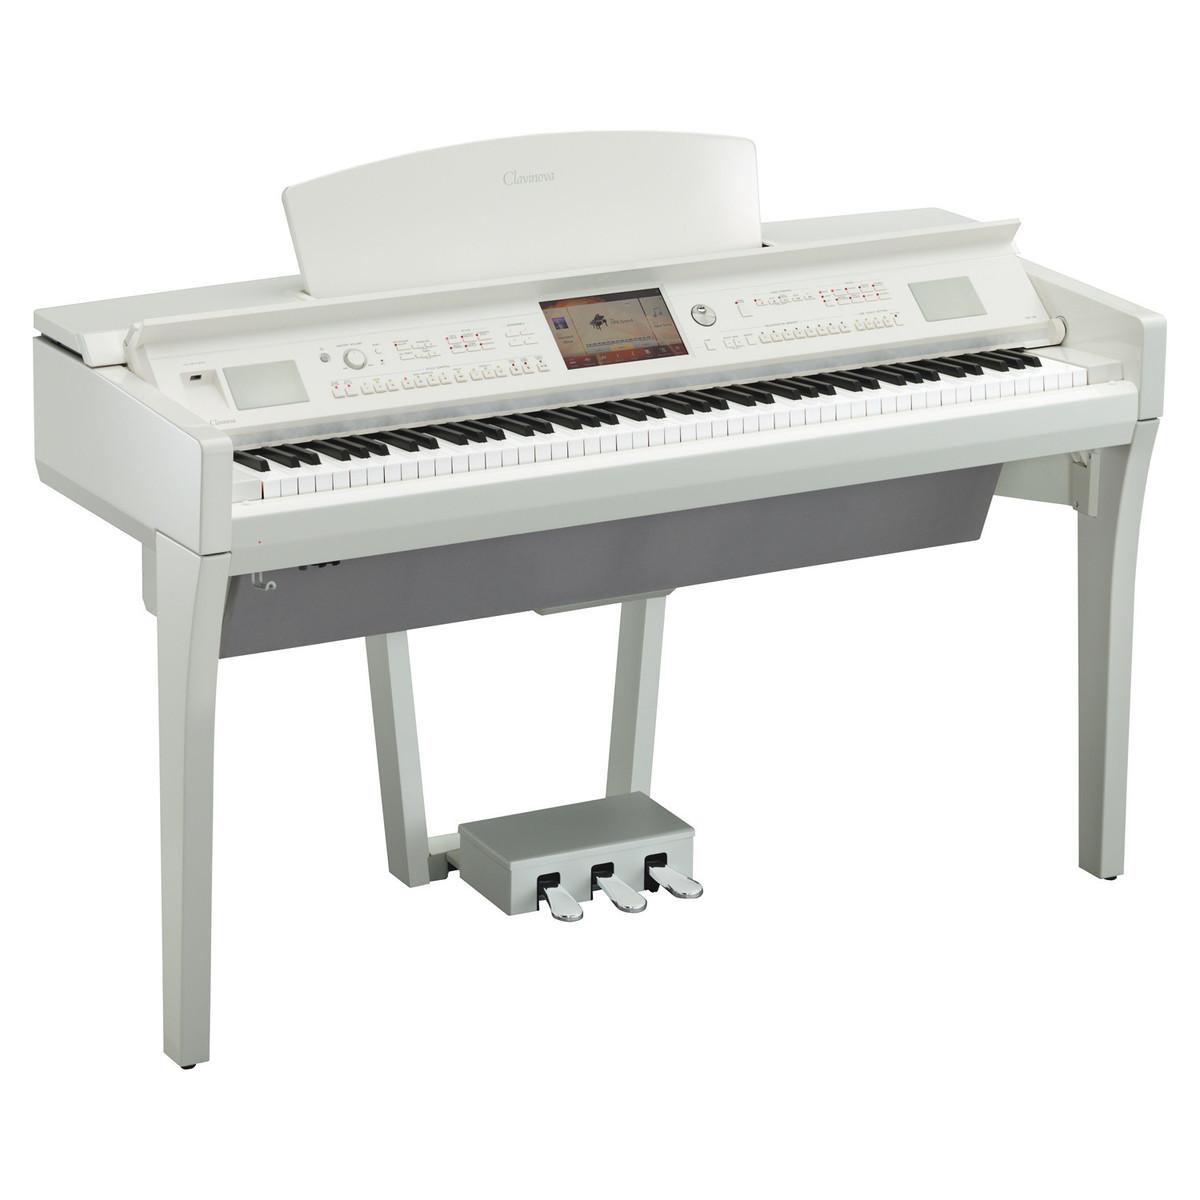 yamaha cvp 709 clavinova digital piano polished white at gear4music. Black Bedroom Furniture Sets. Home Design Ideas